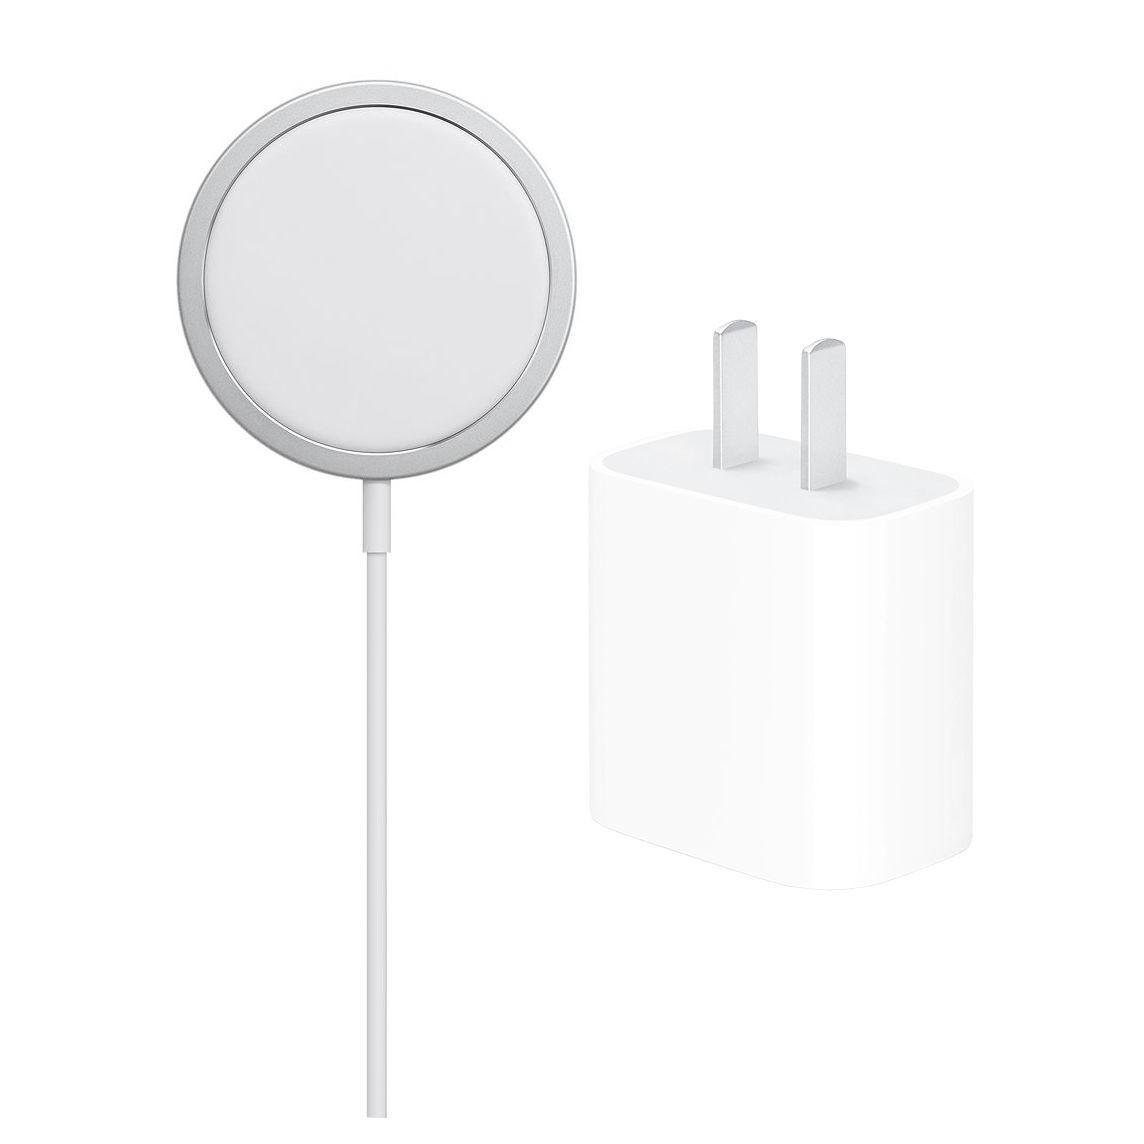 Apple 苹果 无线充电器 Magsafe 20W